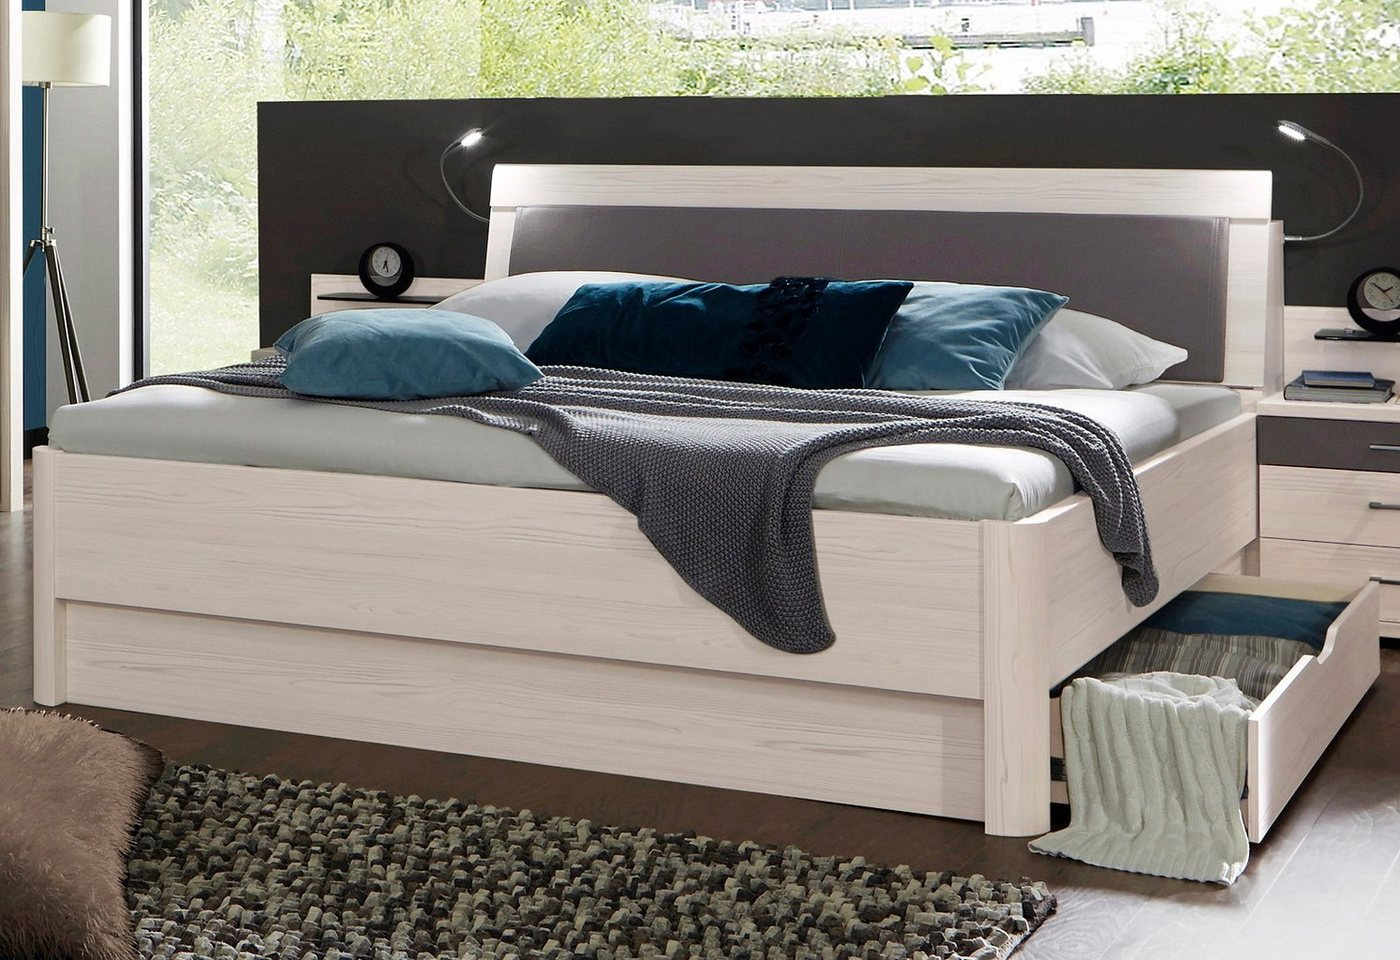 WIEMANN Bed met pool-lariks decor